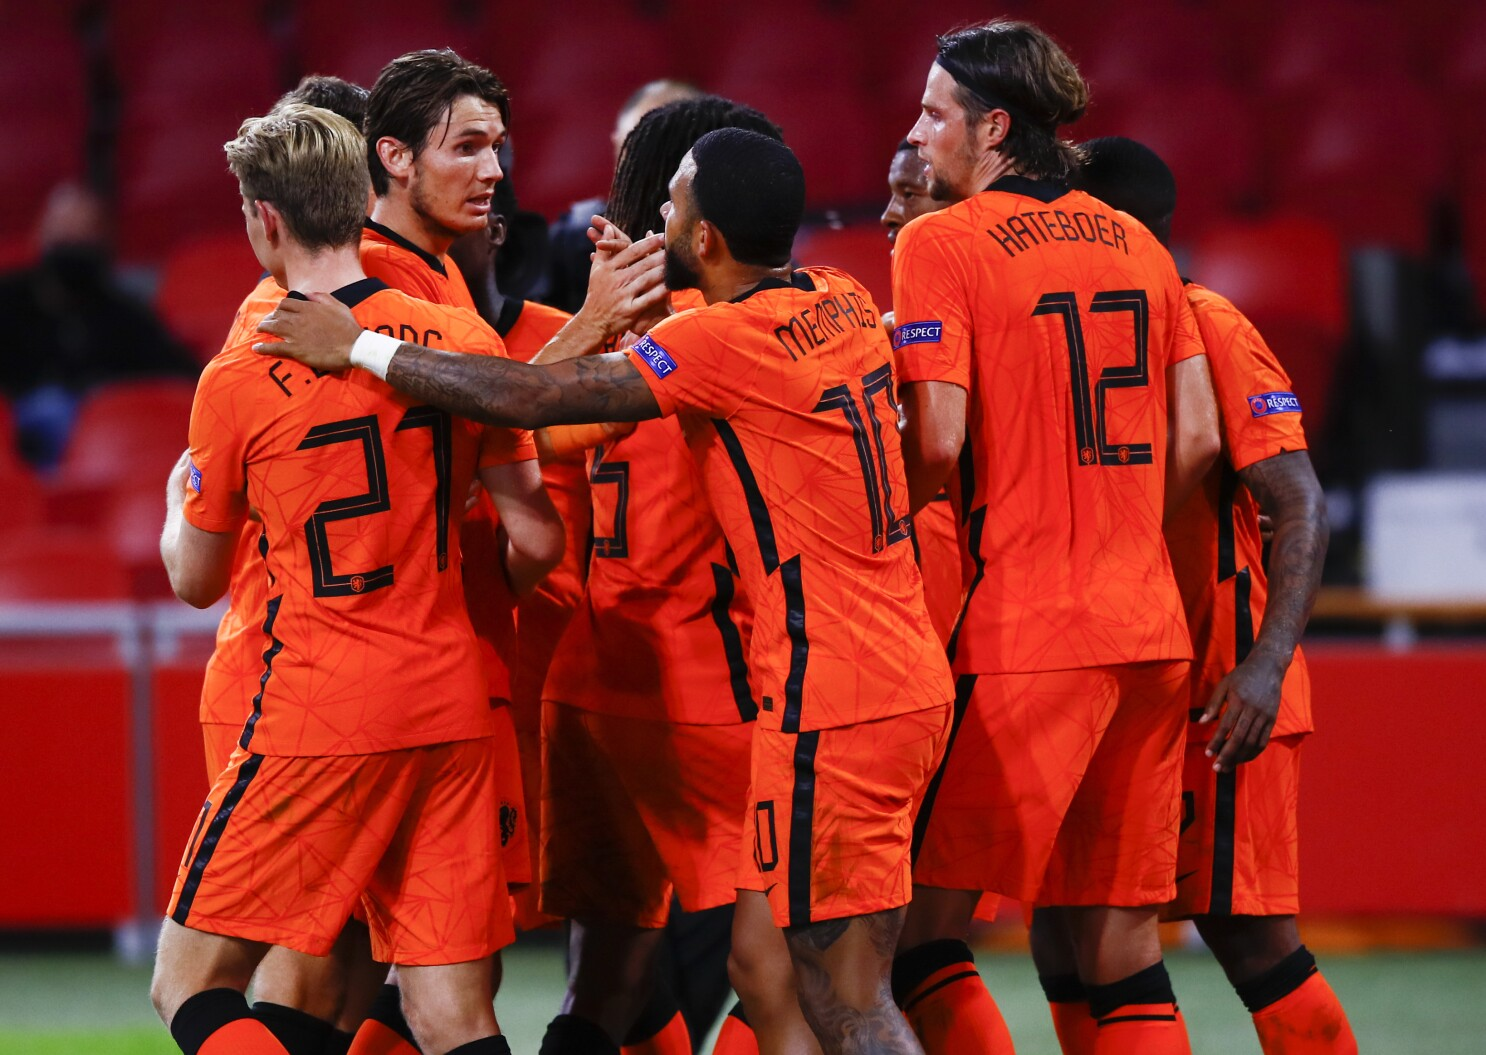 Steven Bergwijn Scores As Netherlands Beats Poland 1 0 The San Diego Union Tribune